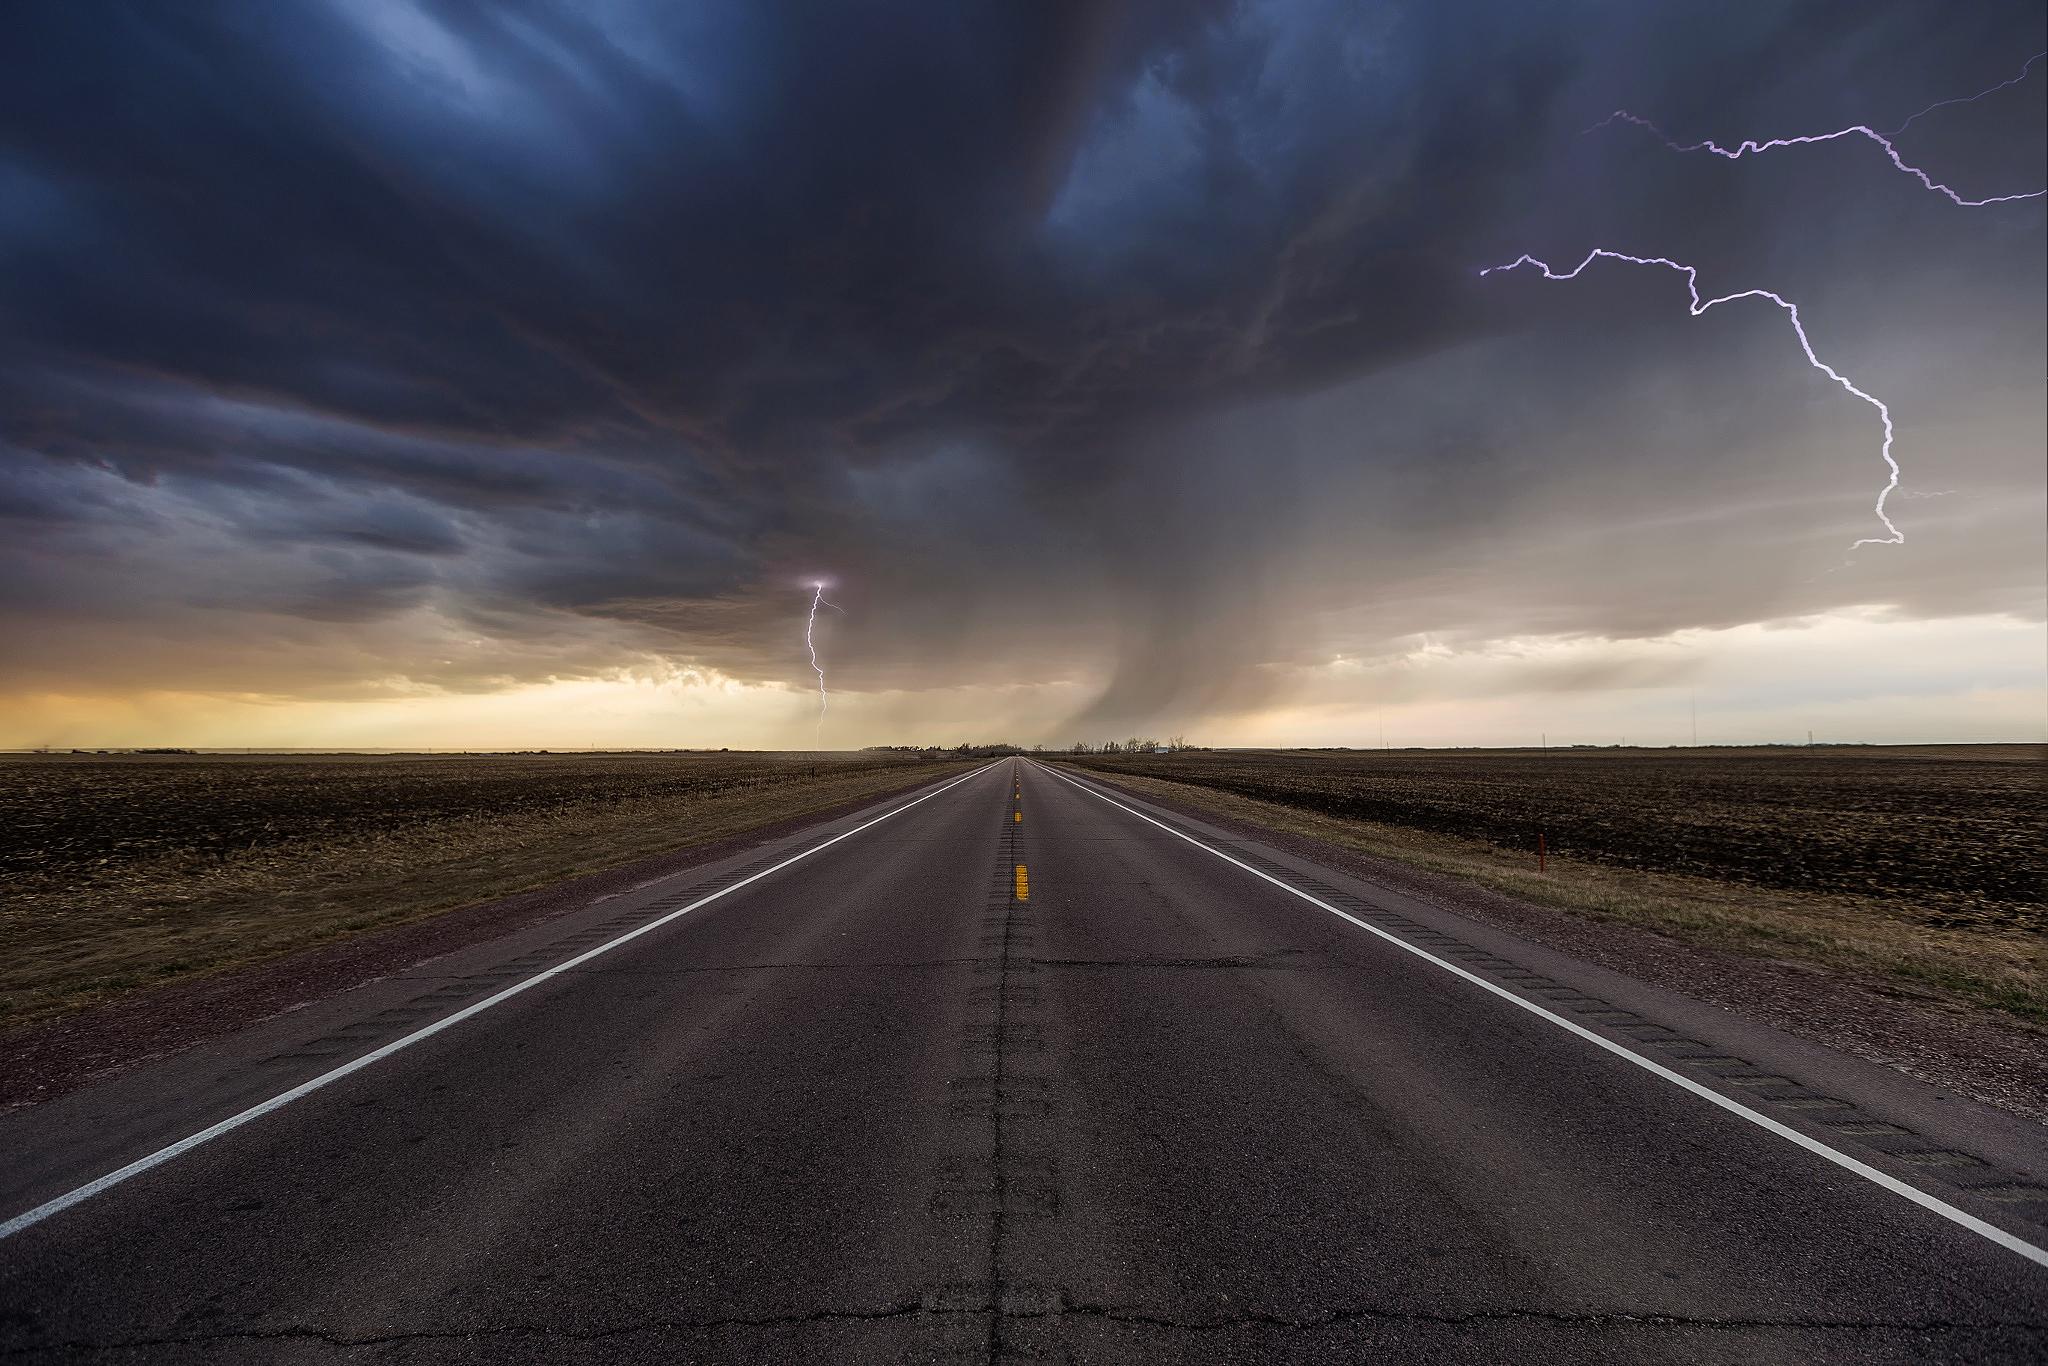 картинки на рабочий стол дорога в небеса